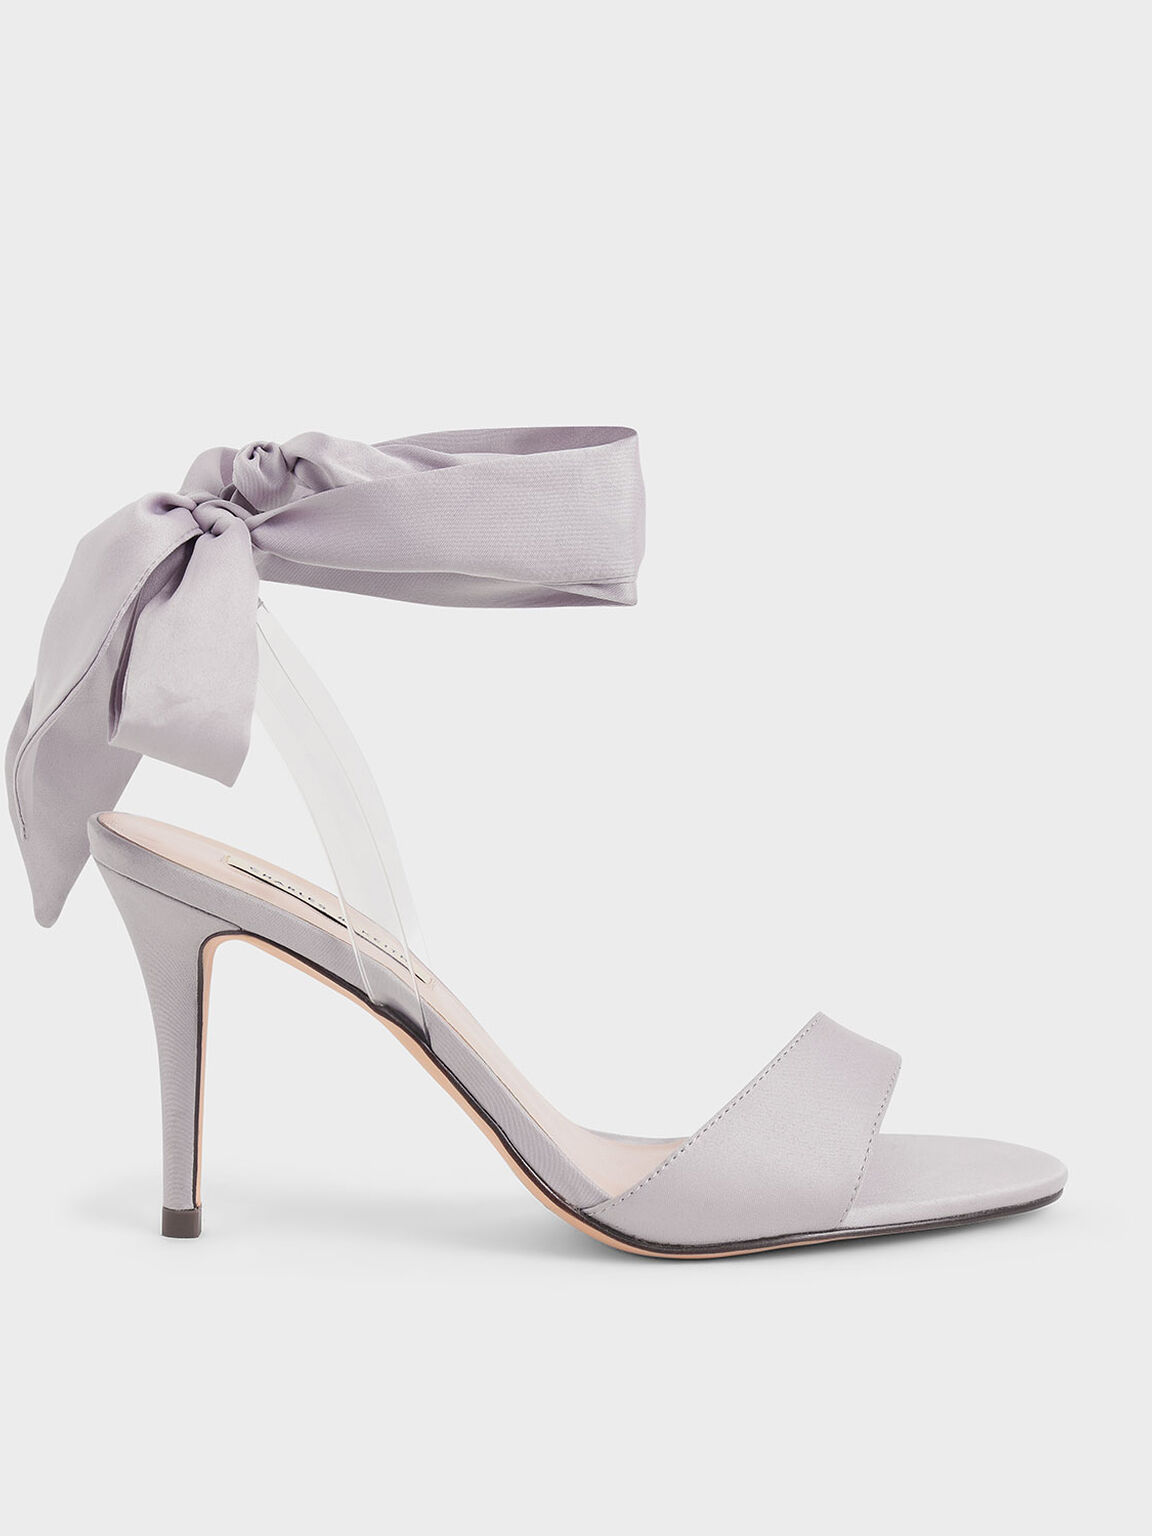 Satin Ribbon Ankle-Tie Sandals, Grey, hi-res